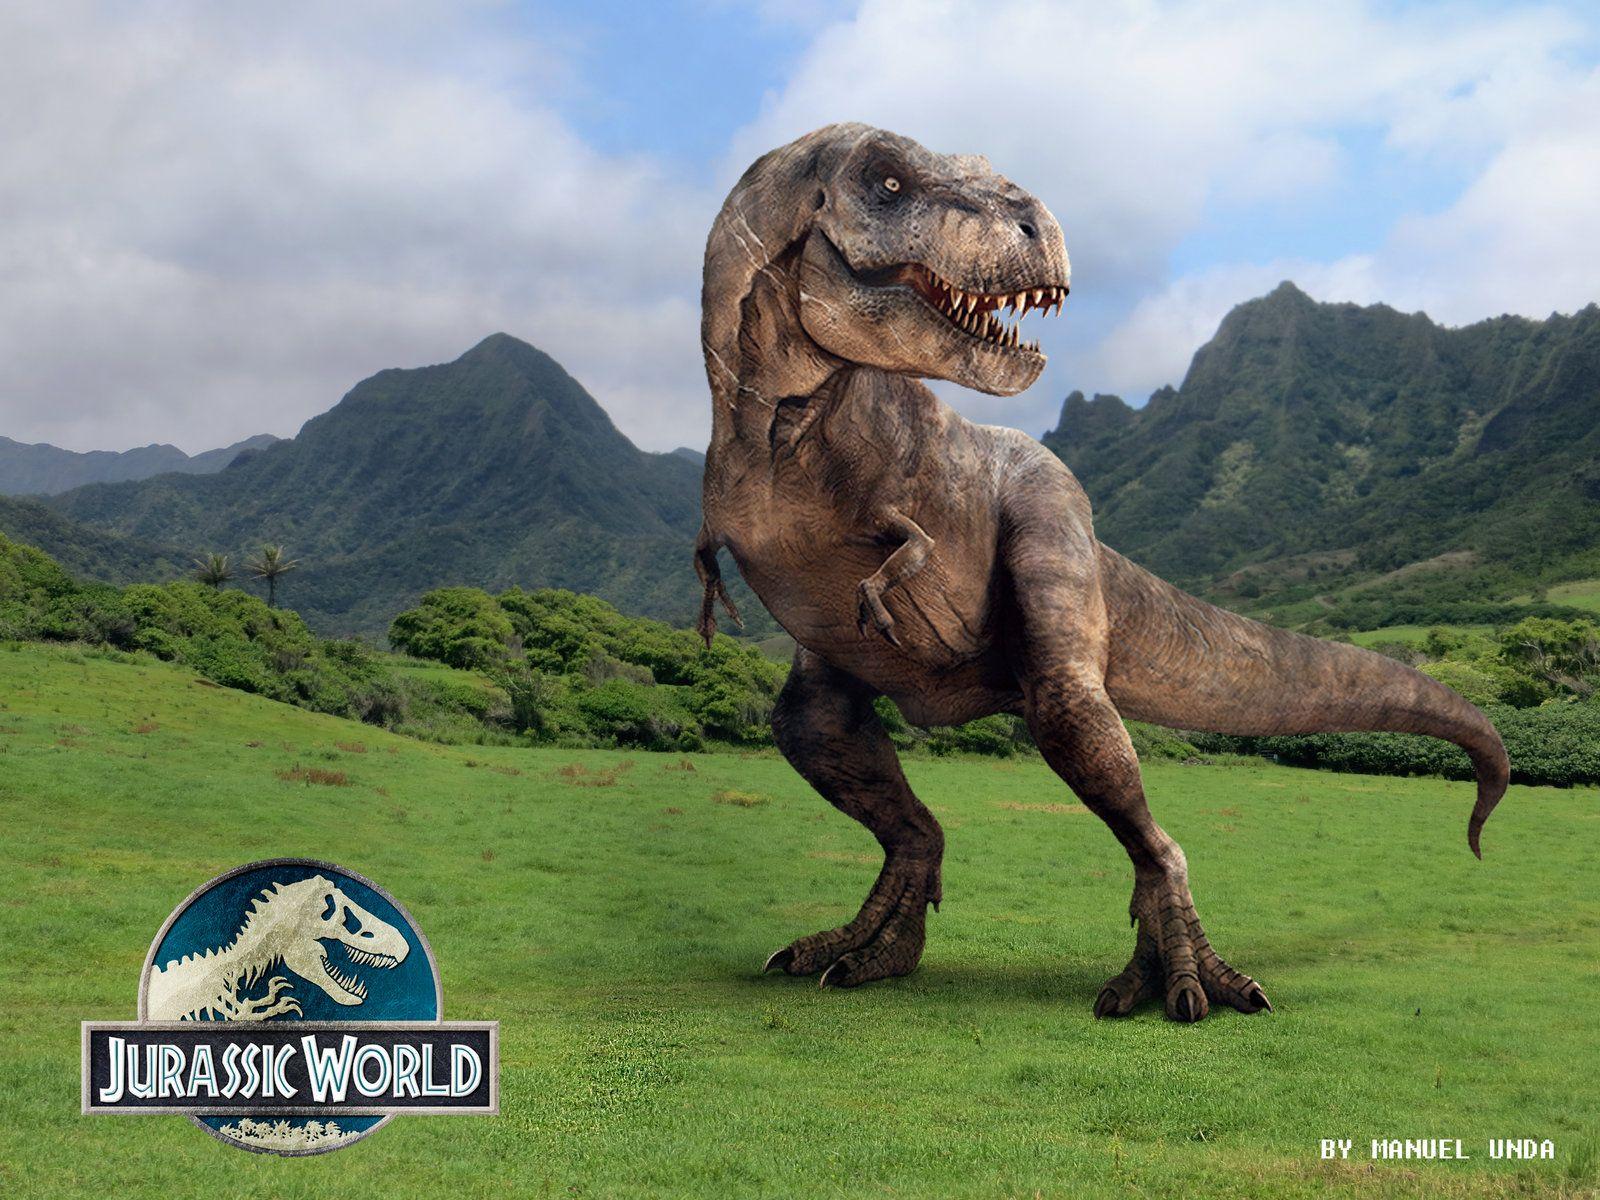 Jurassic Park T-rex Wallpaper Desktop Background For Desktop Wallpaper 1600 x 1200 px 576.92 KB ...